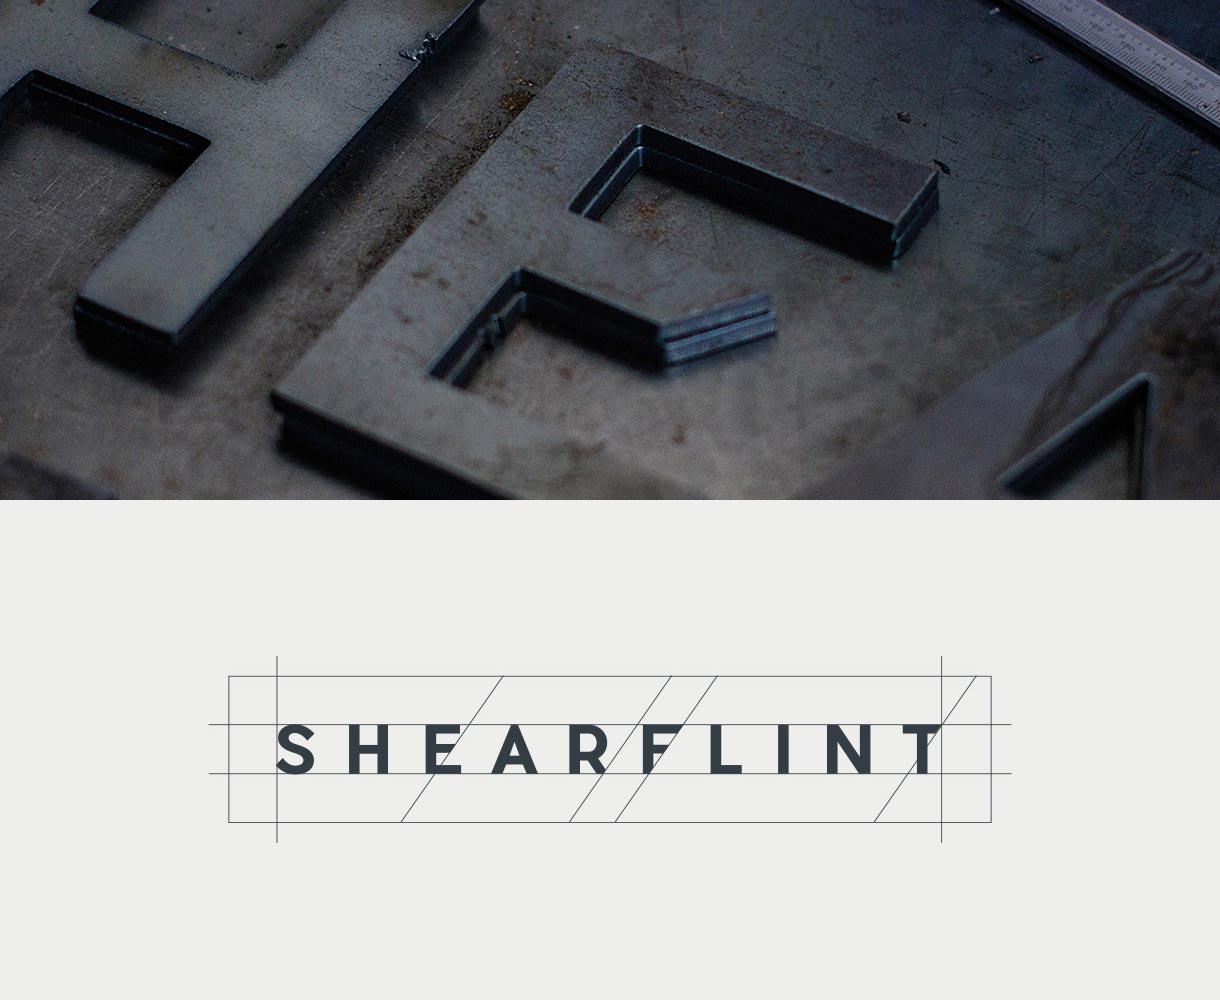 Shearflint-Brand-signage